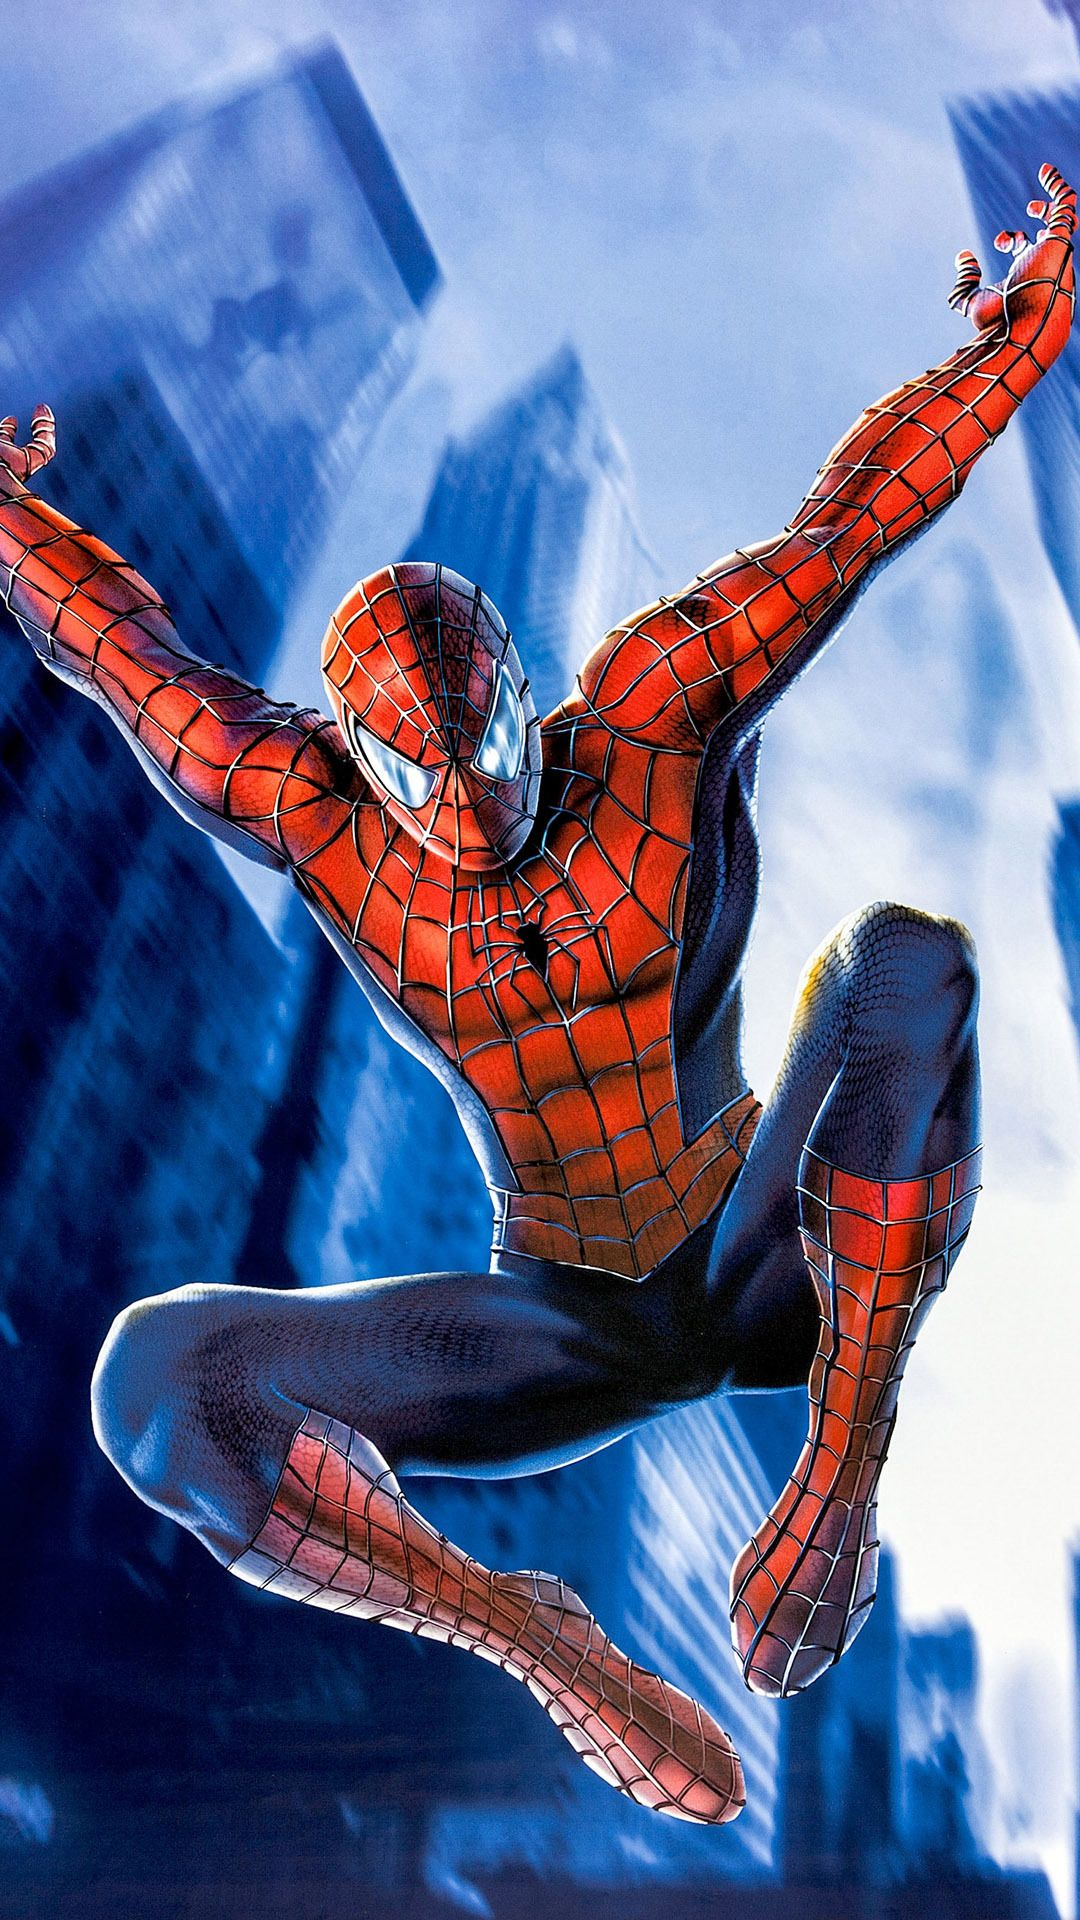 Black Spiderman Wallpapers Wallpaper Hd Wallpapers HD Wallpapers Download Free Images Wallpaper [1000image.com]